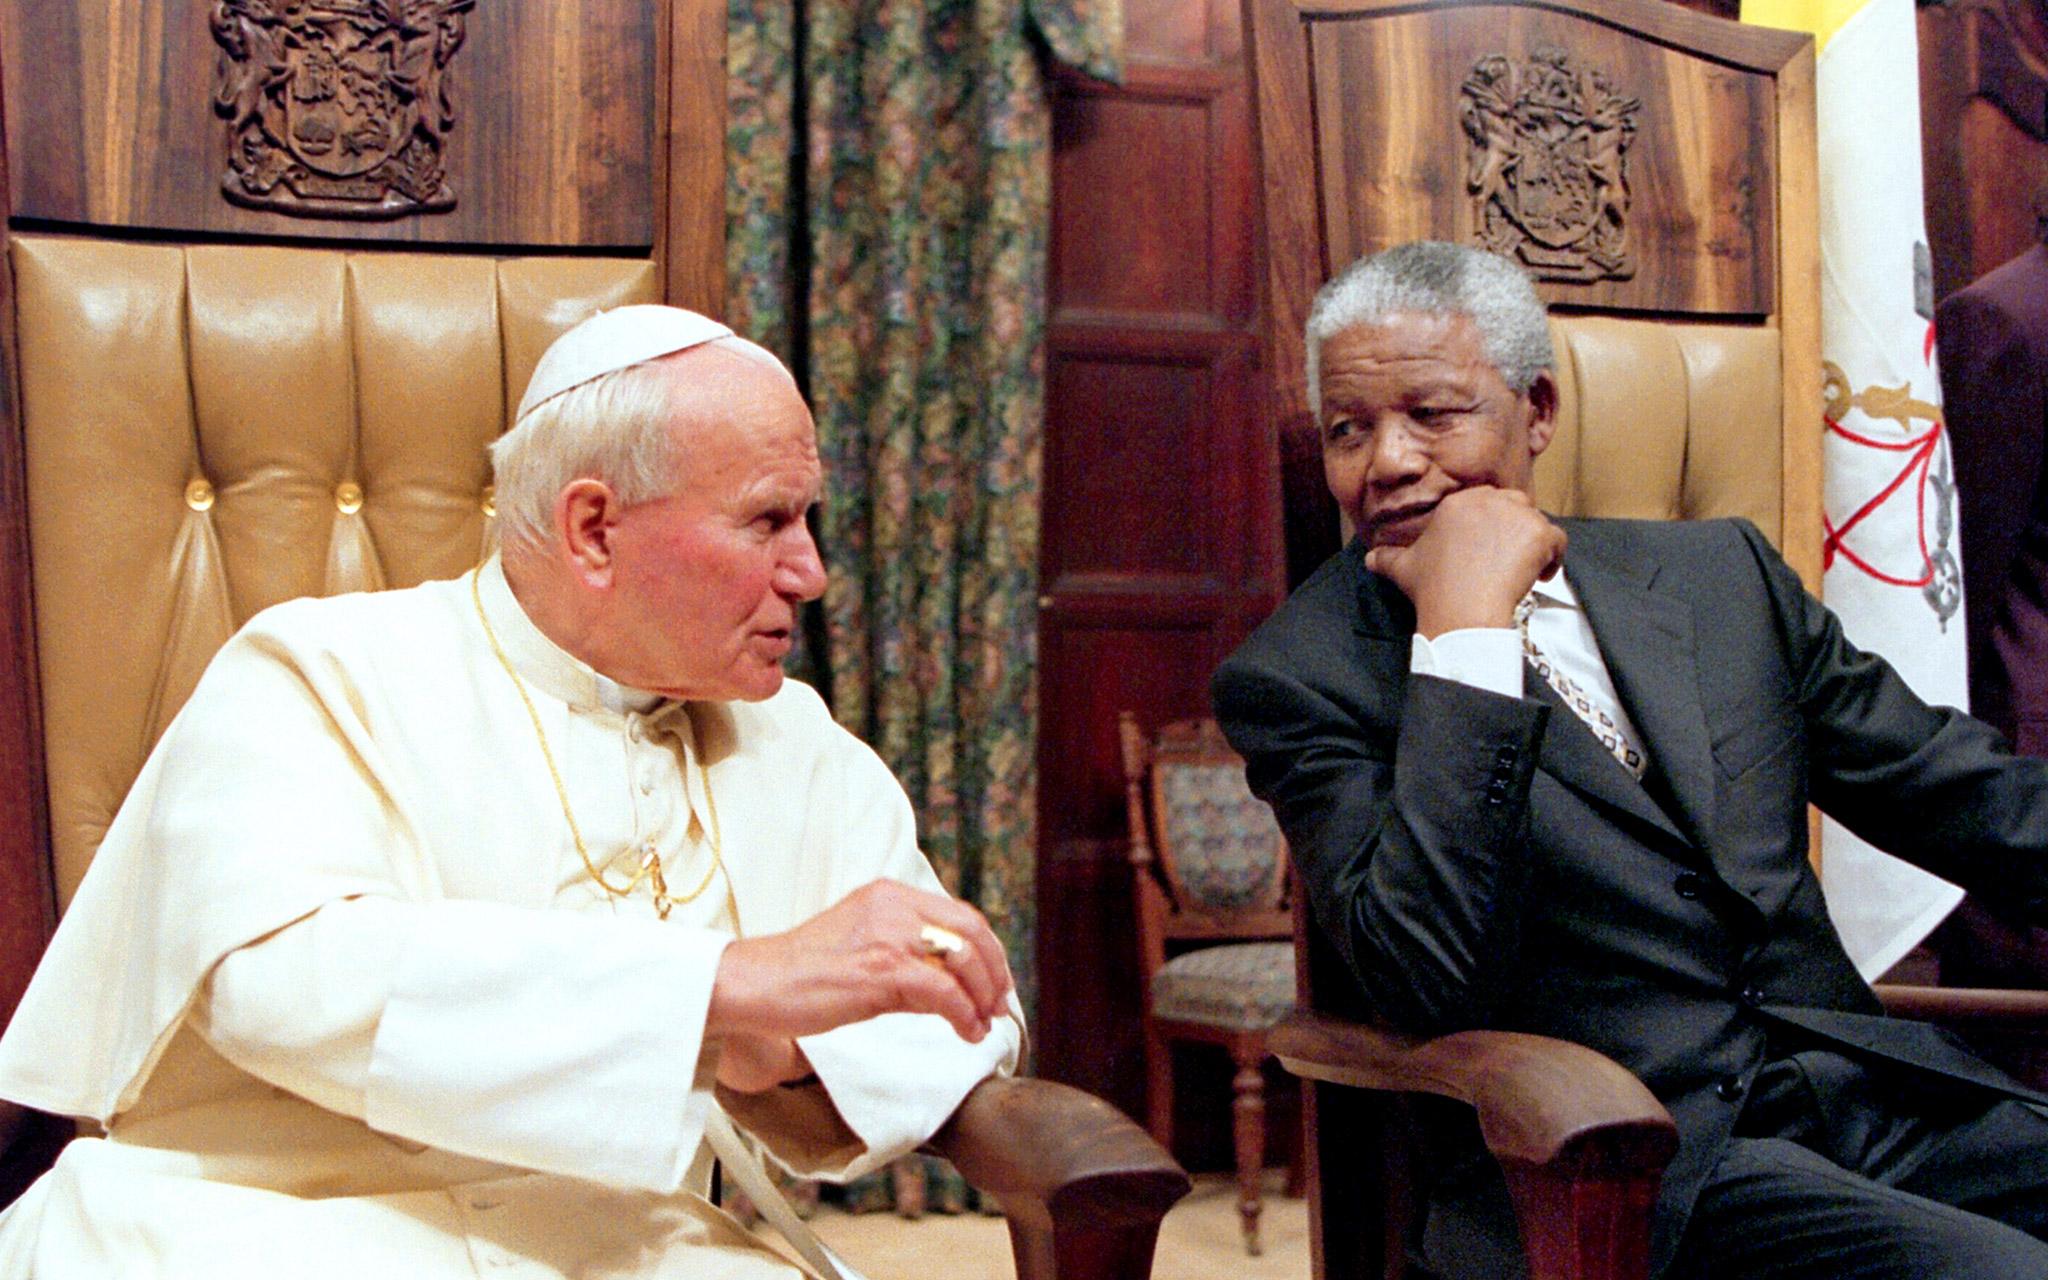 Pope John Paul II and Nelson Mandela